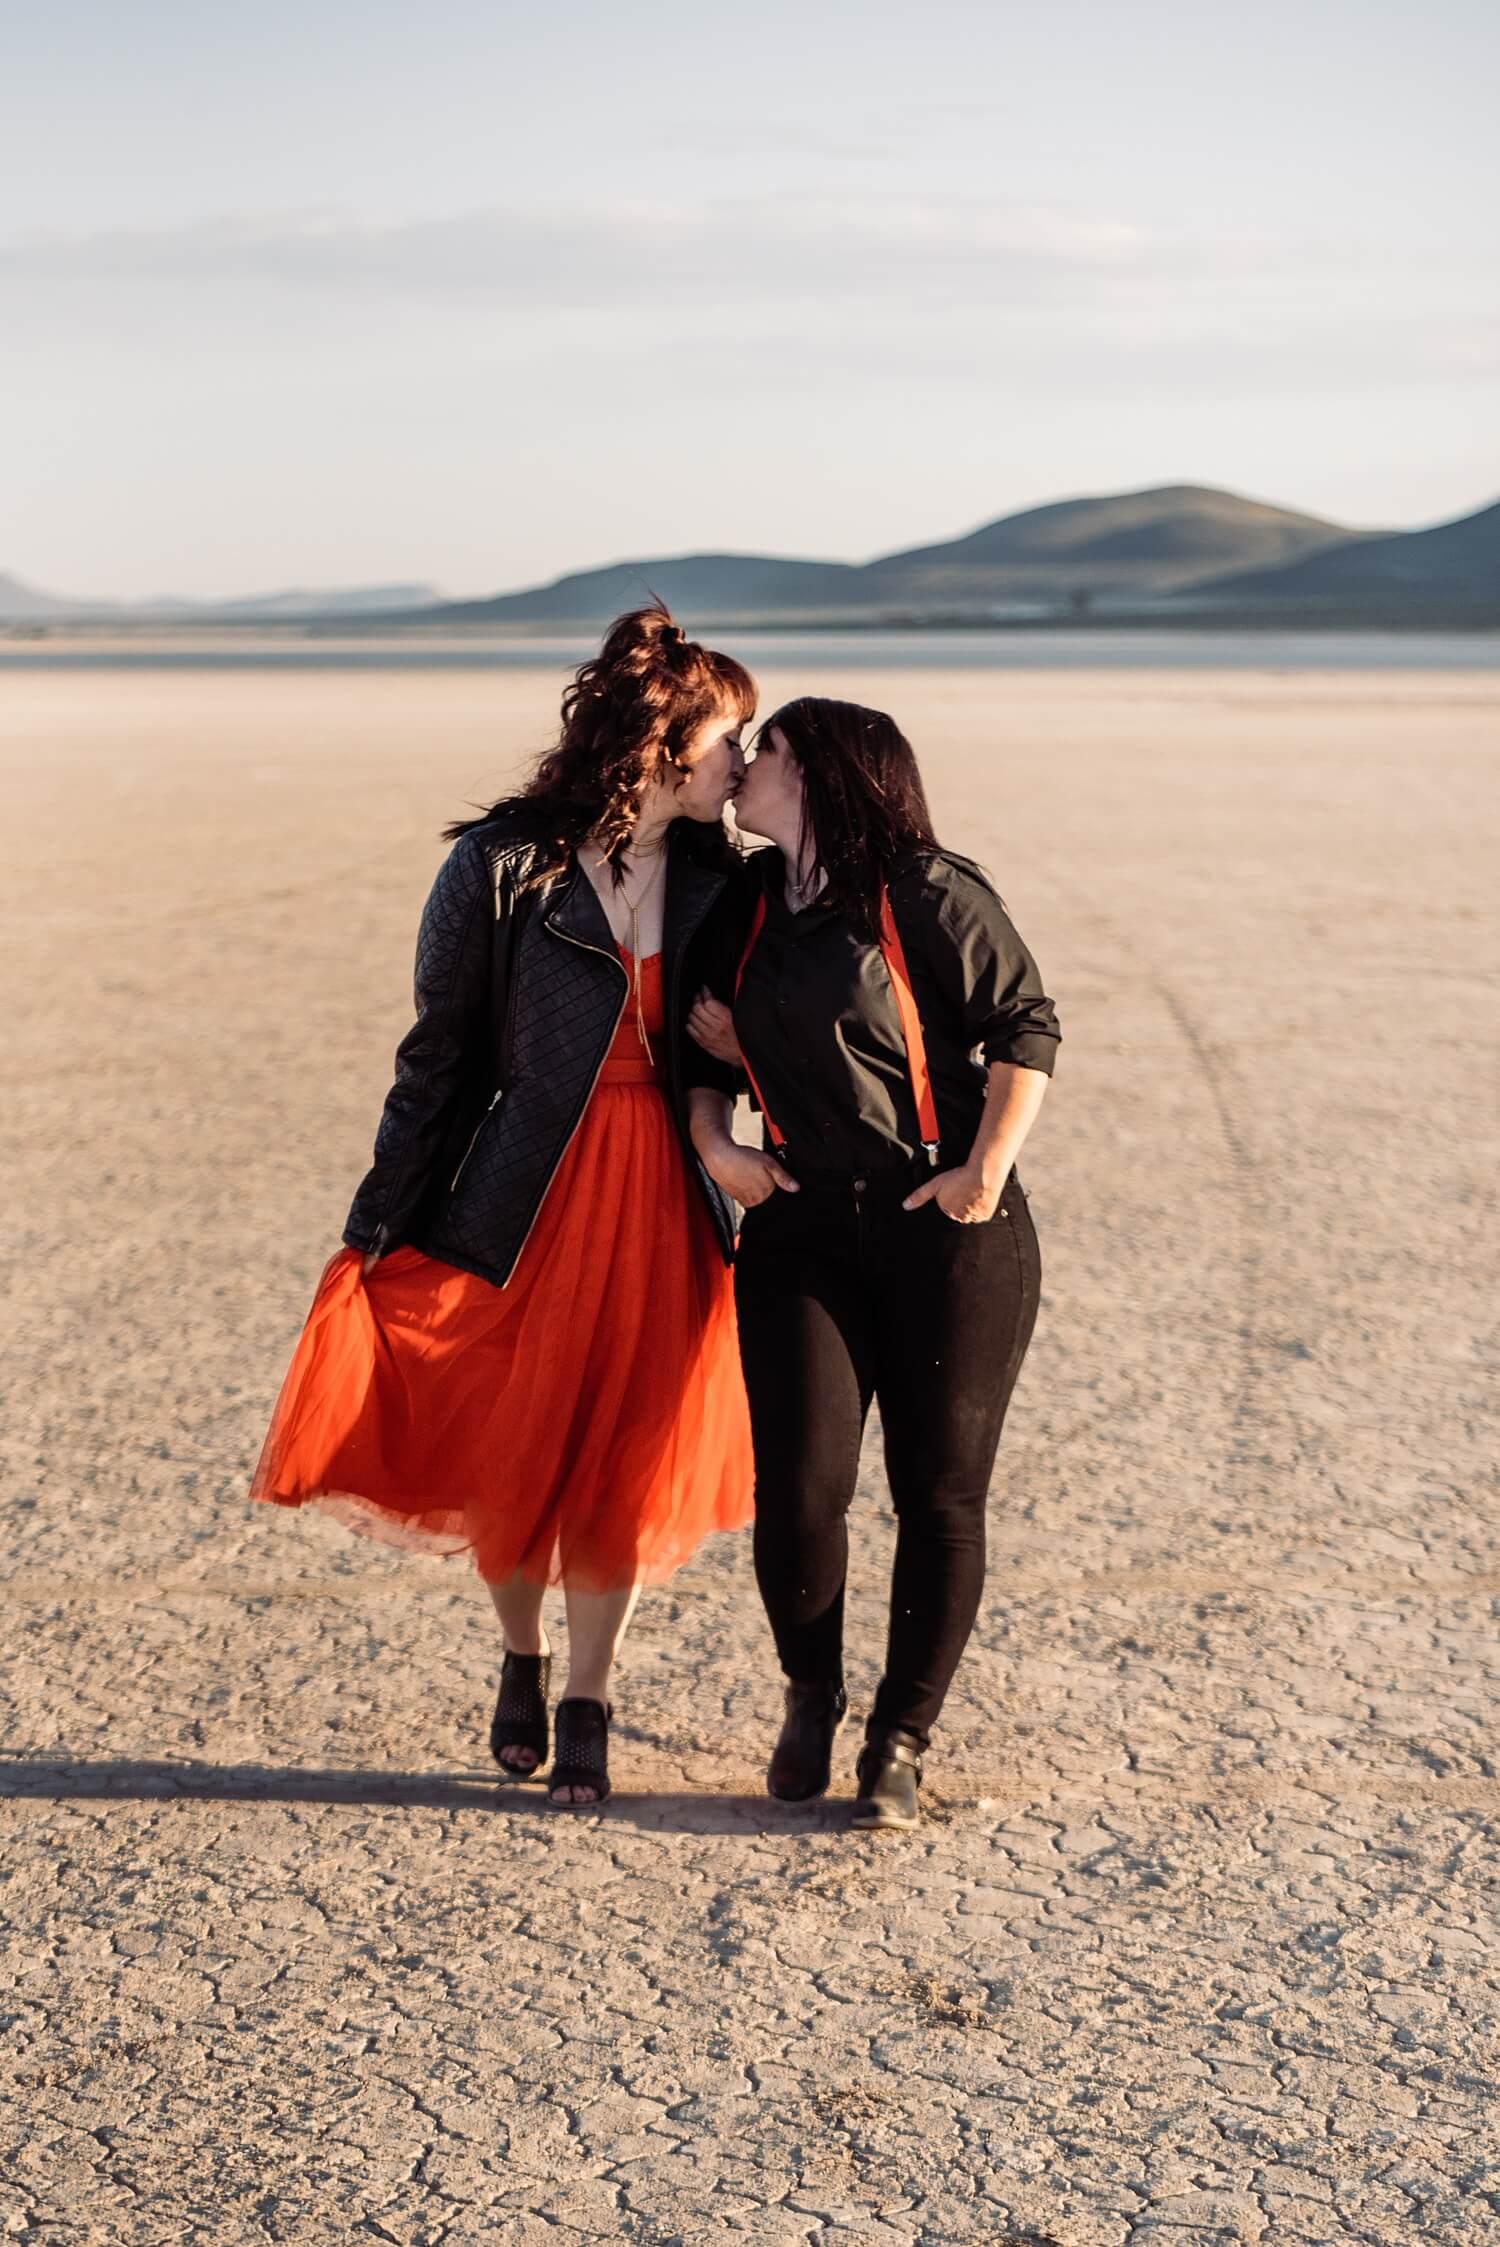 adventure elopement photographer,adventure session,alvord desert,couples session,desert,engagement session,oregon,pacific northwest,playa,southeastern oregon,